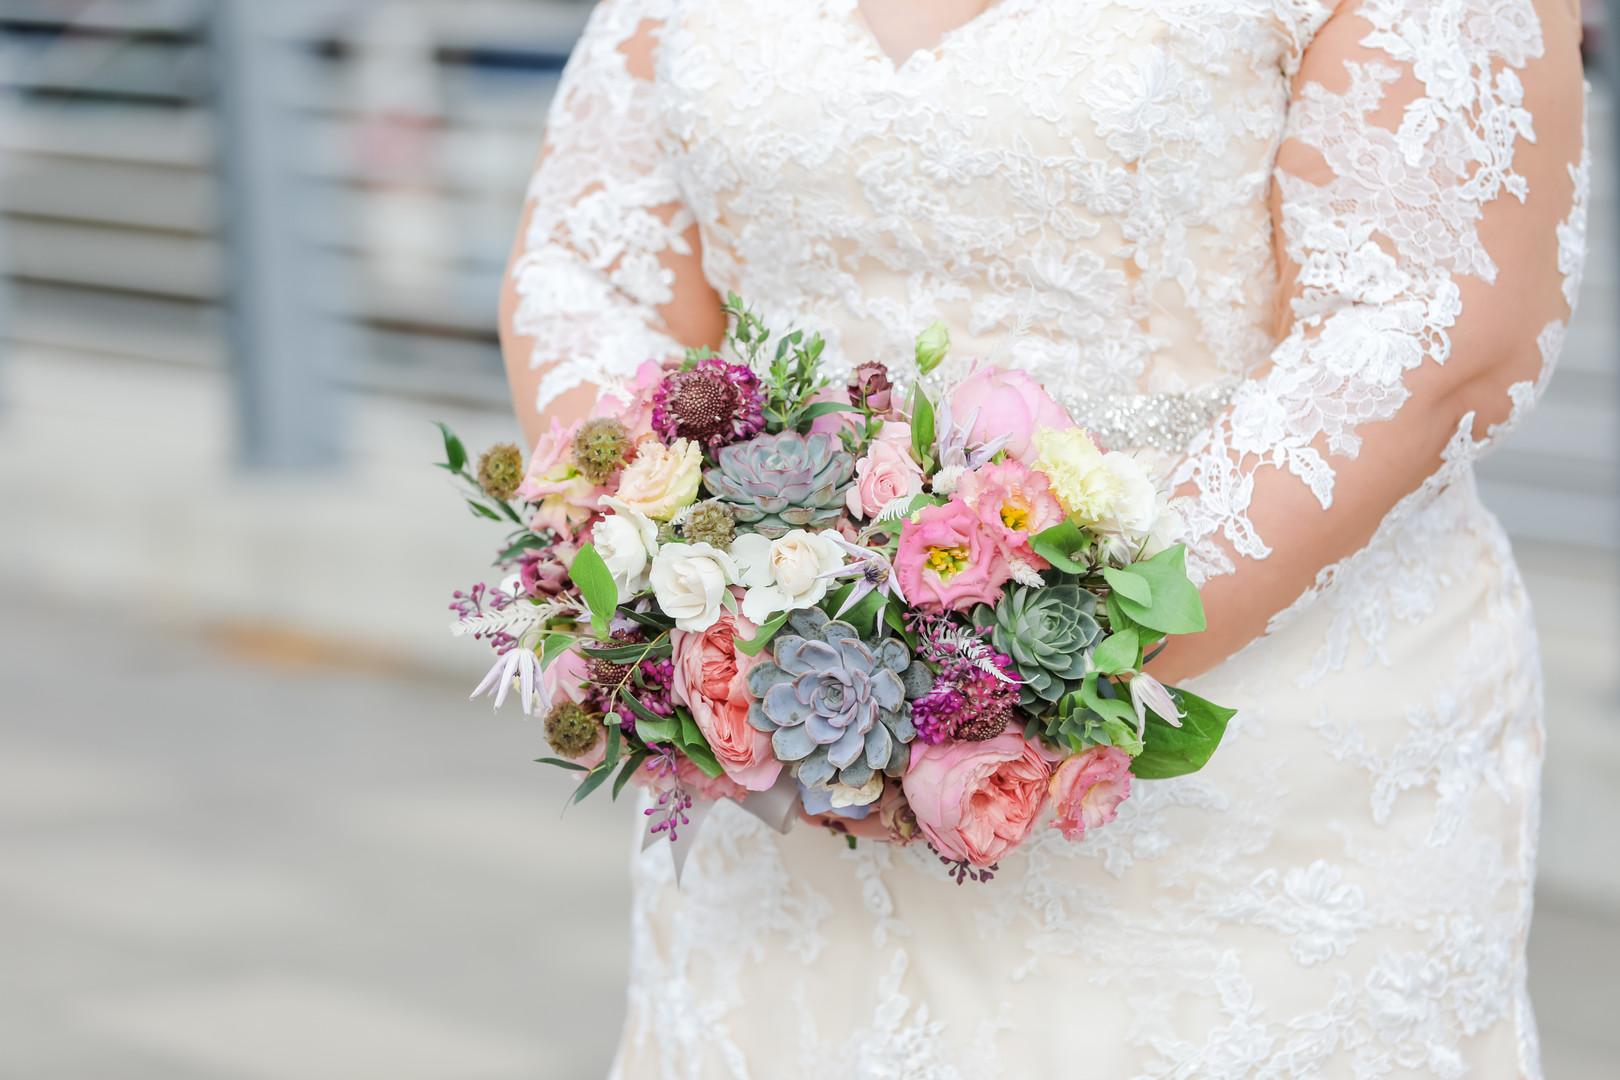 Madison's bouquet